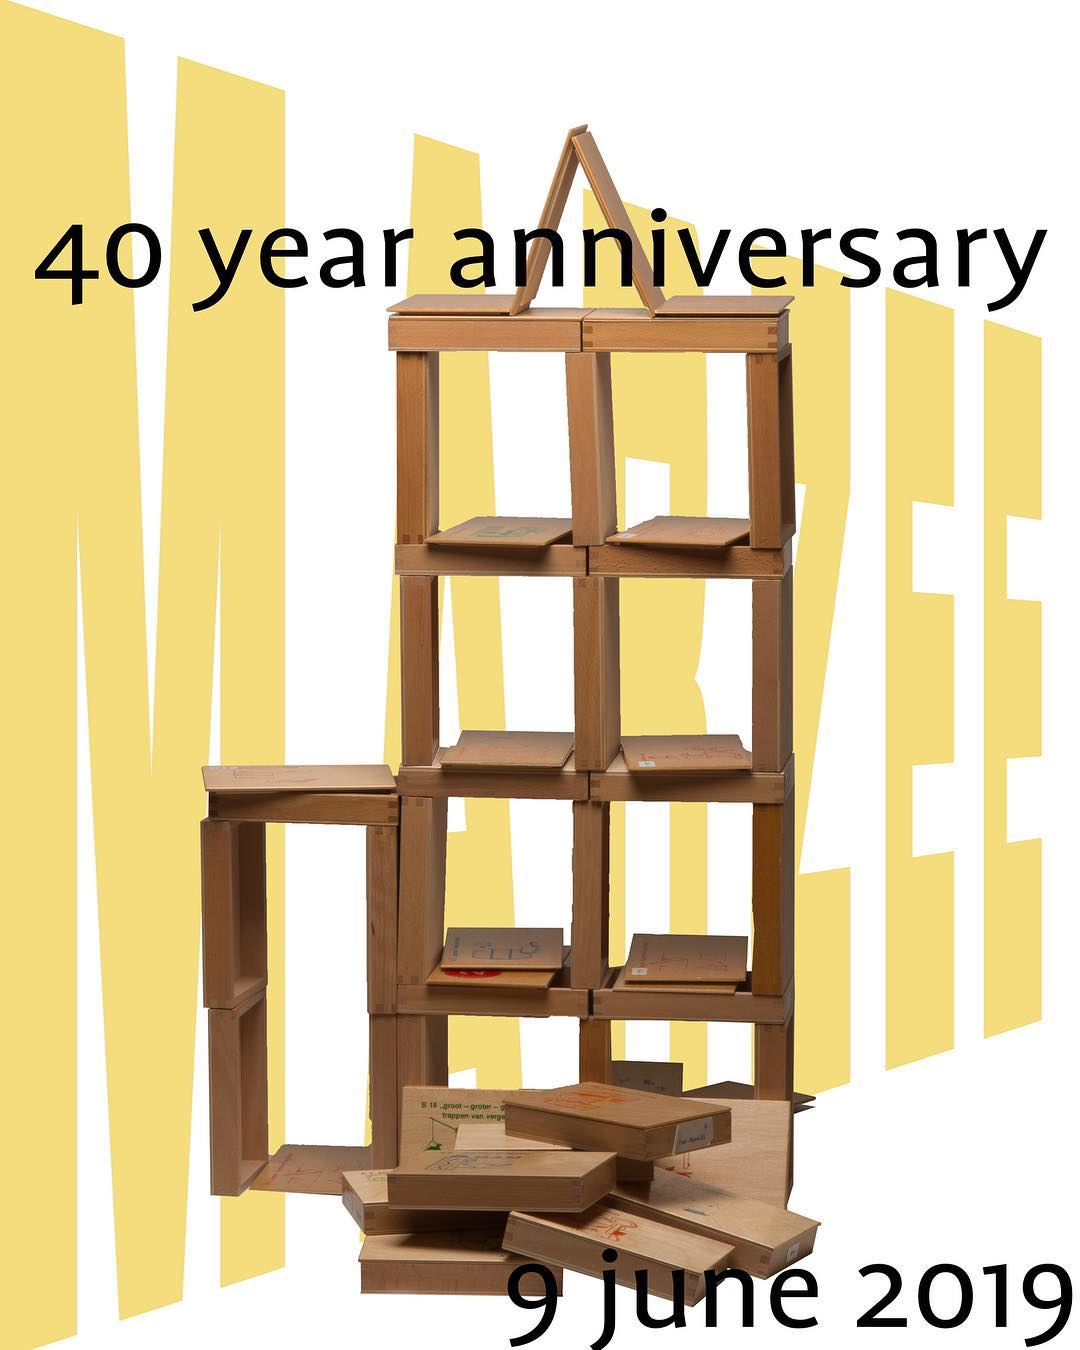 PRESENT - 40 years of Galerie Marzee, 2019. Foto met dank aan Galerie Marzee©